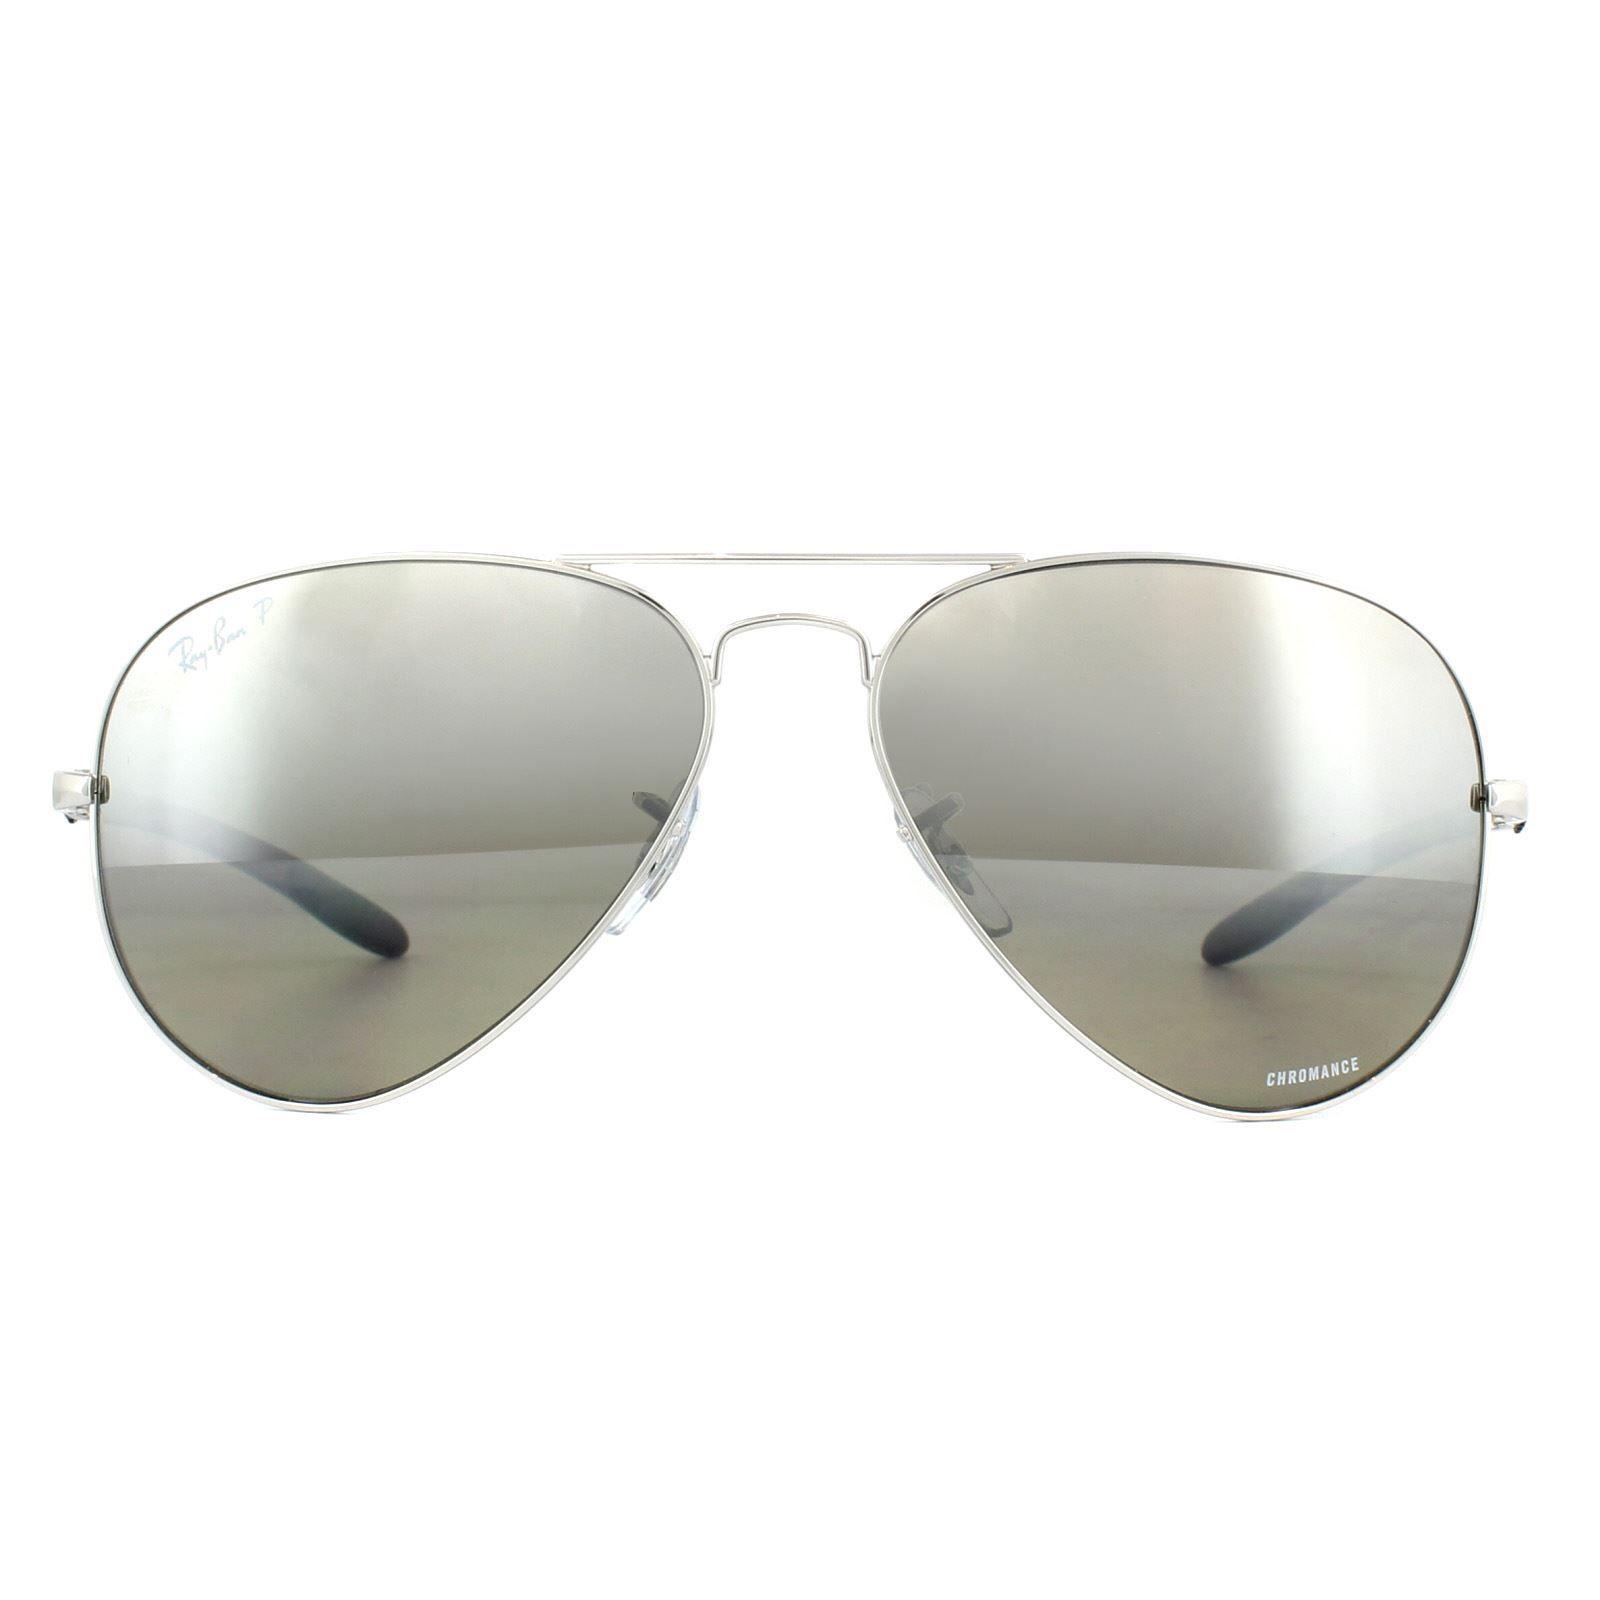 Ray-Ban Sunglasses RB8317CH 003/5J Aviator Silver Mirror Polarized Chromance